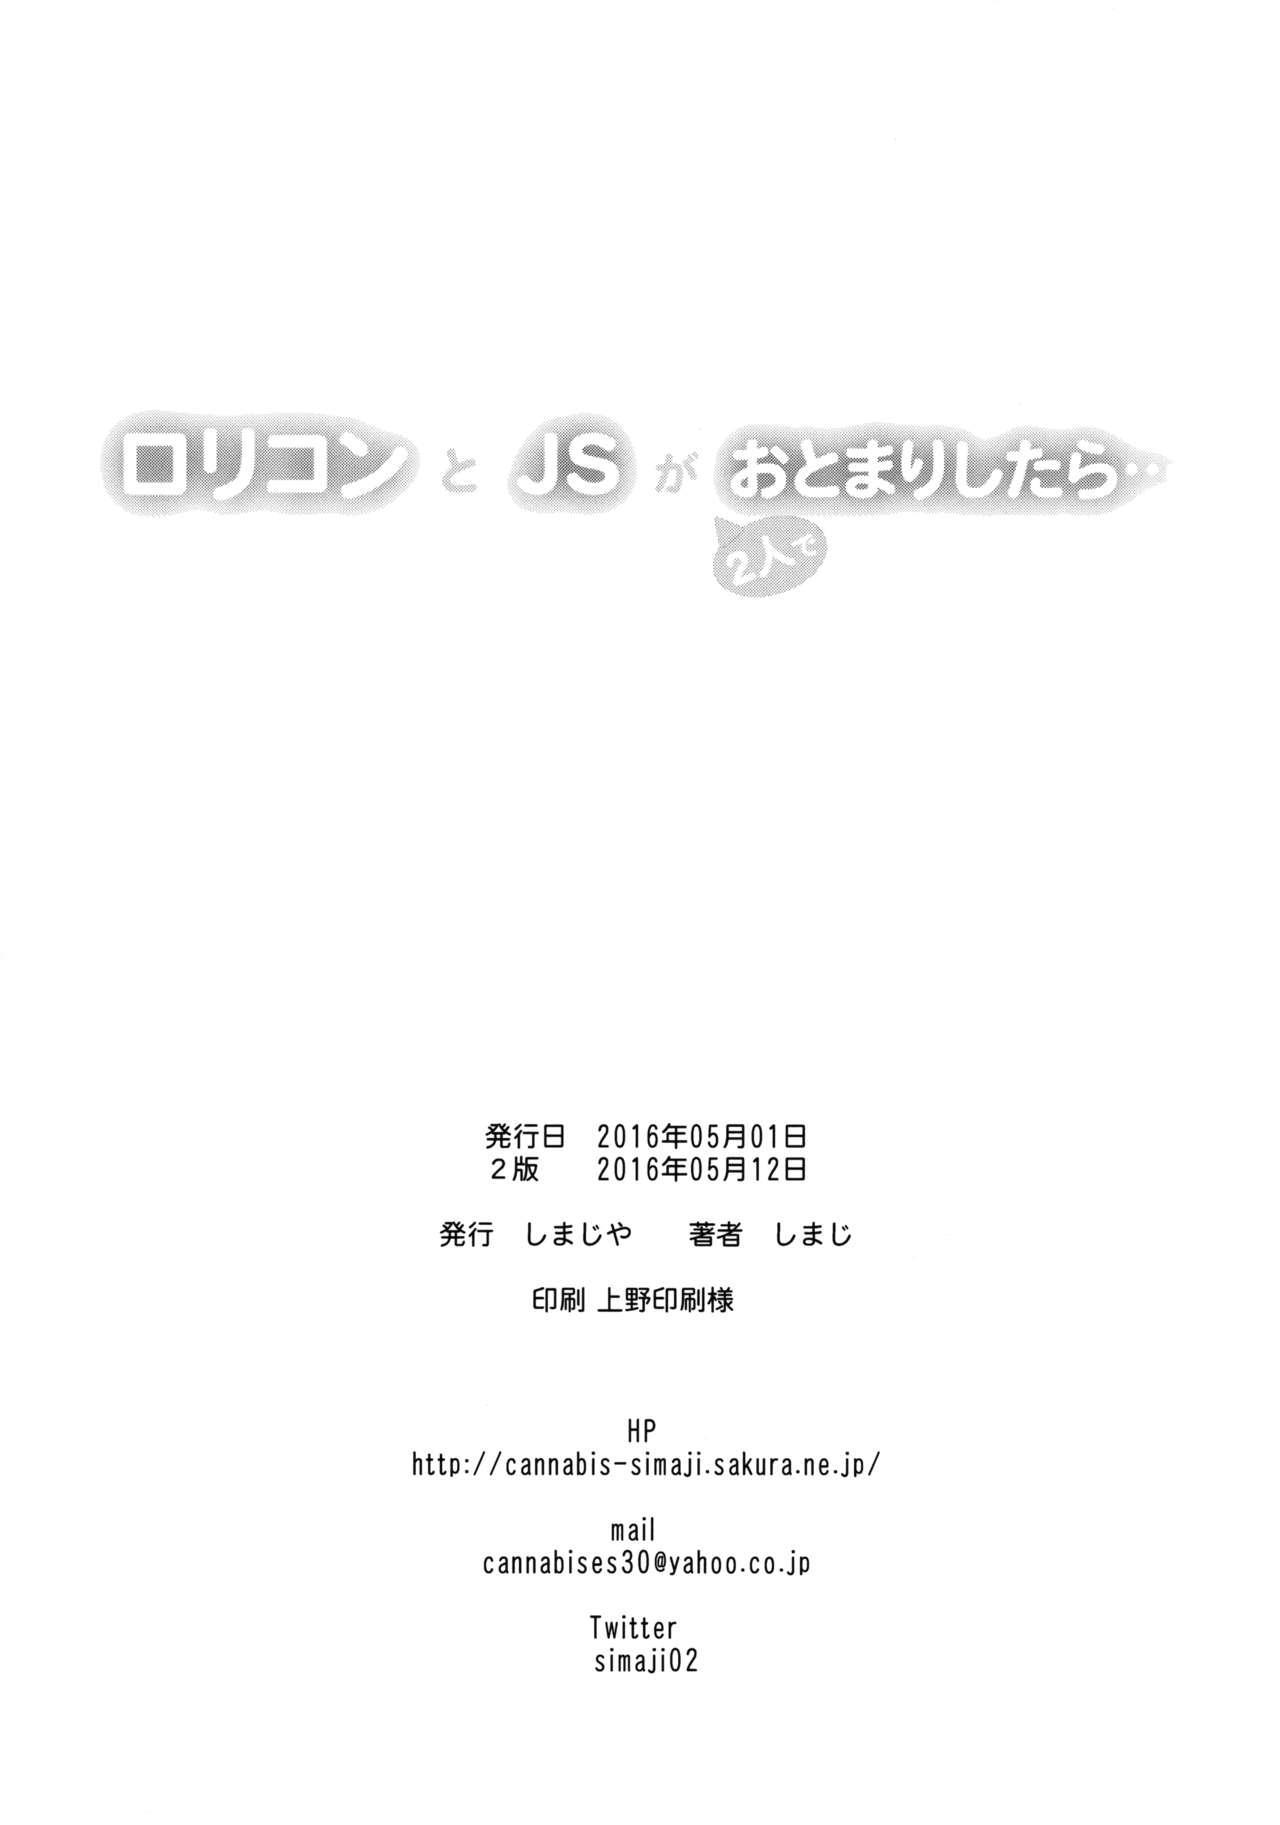 Lolicon to JS ga Futari de Otomari Shitara... | When A Grade Schooler & A Pedo Stay The Night 24